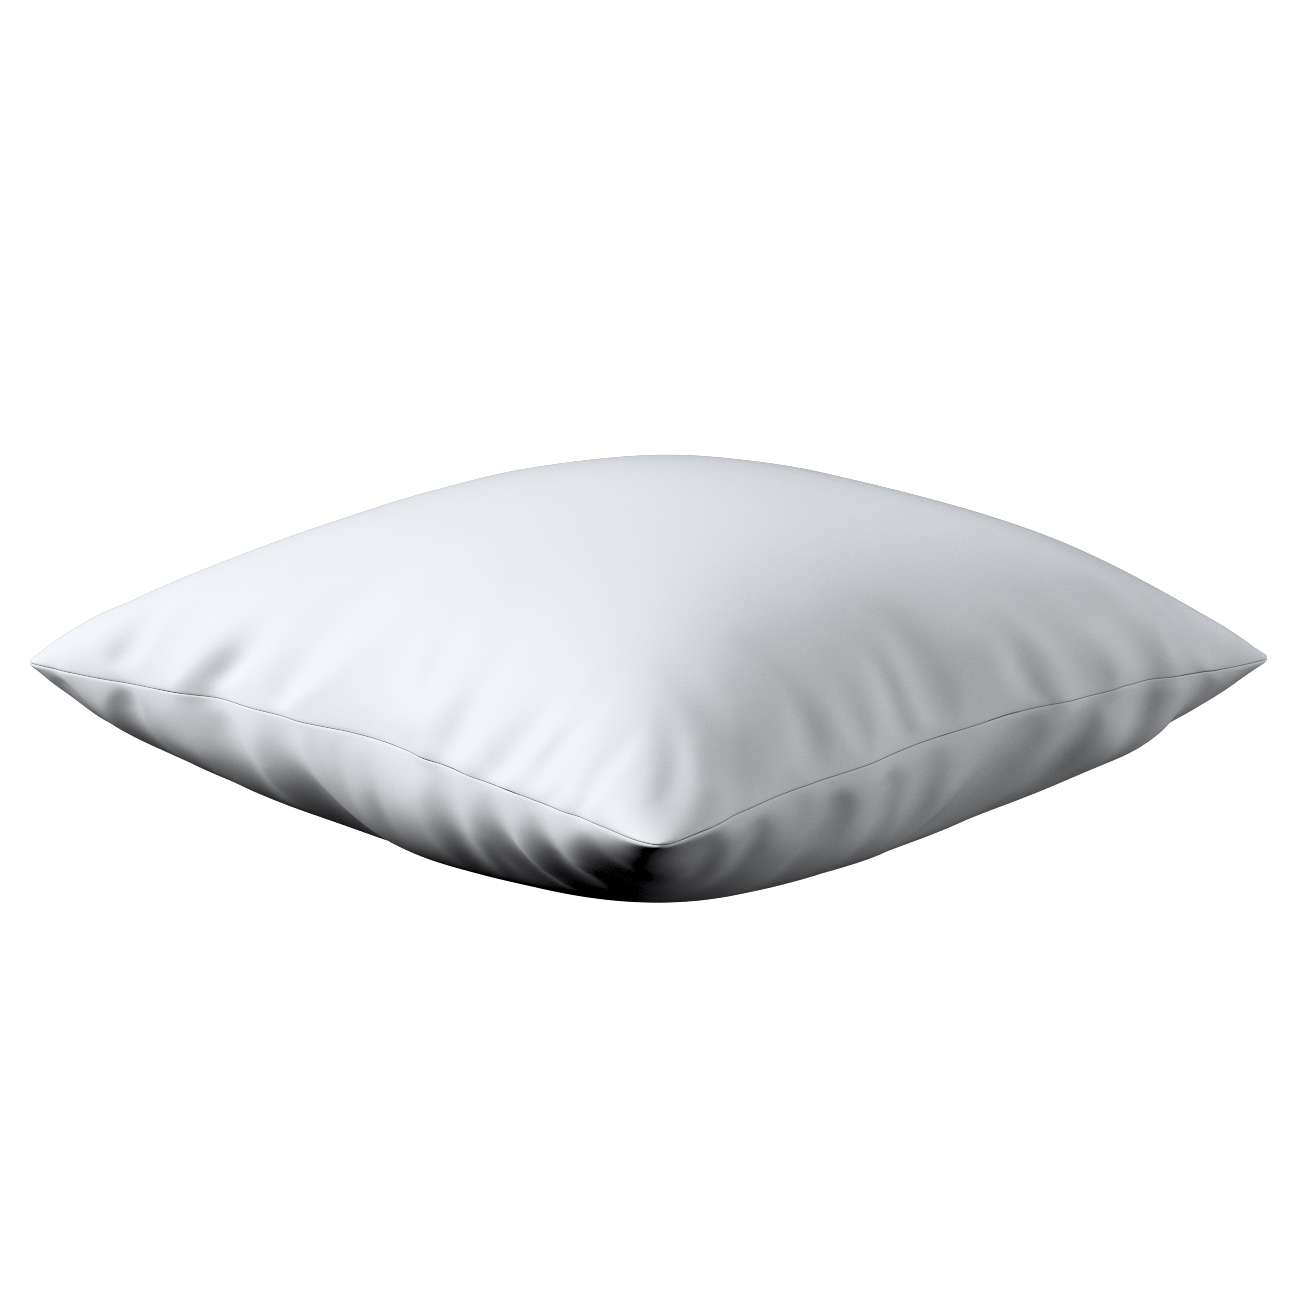 Kinga cushion cover 43 × 43 cm (17 × 17 inch) in collection Damasco, fabric: 141-78